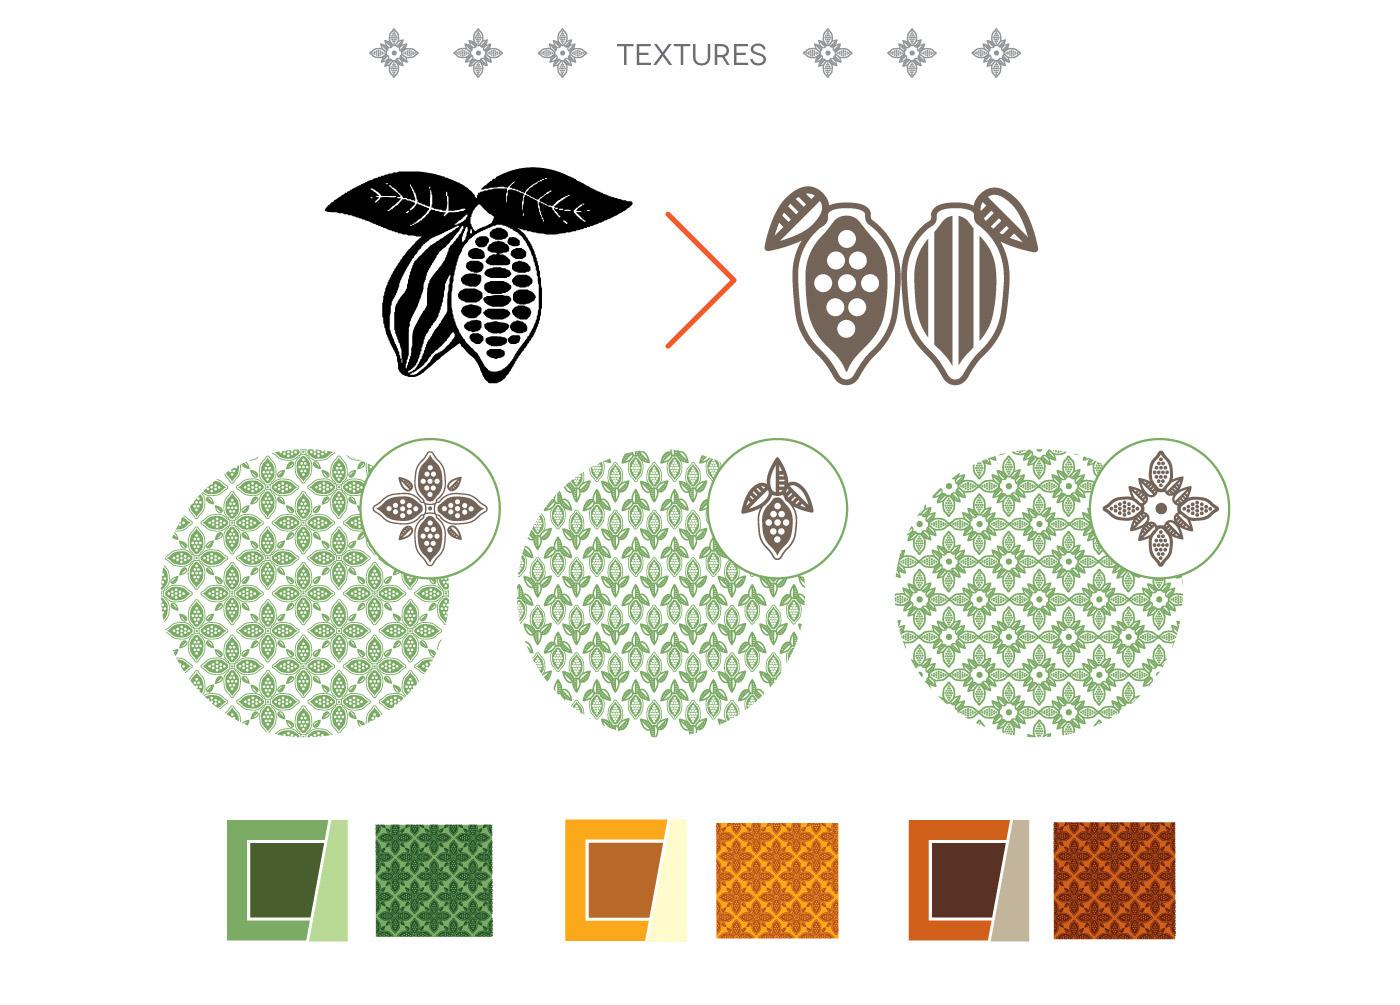 Packaging chocolate cacao mexico empaque textura latinoamerica mayan branding  Vegano